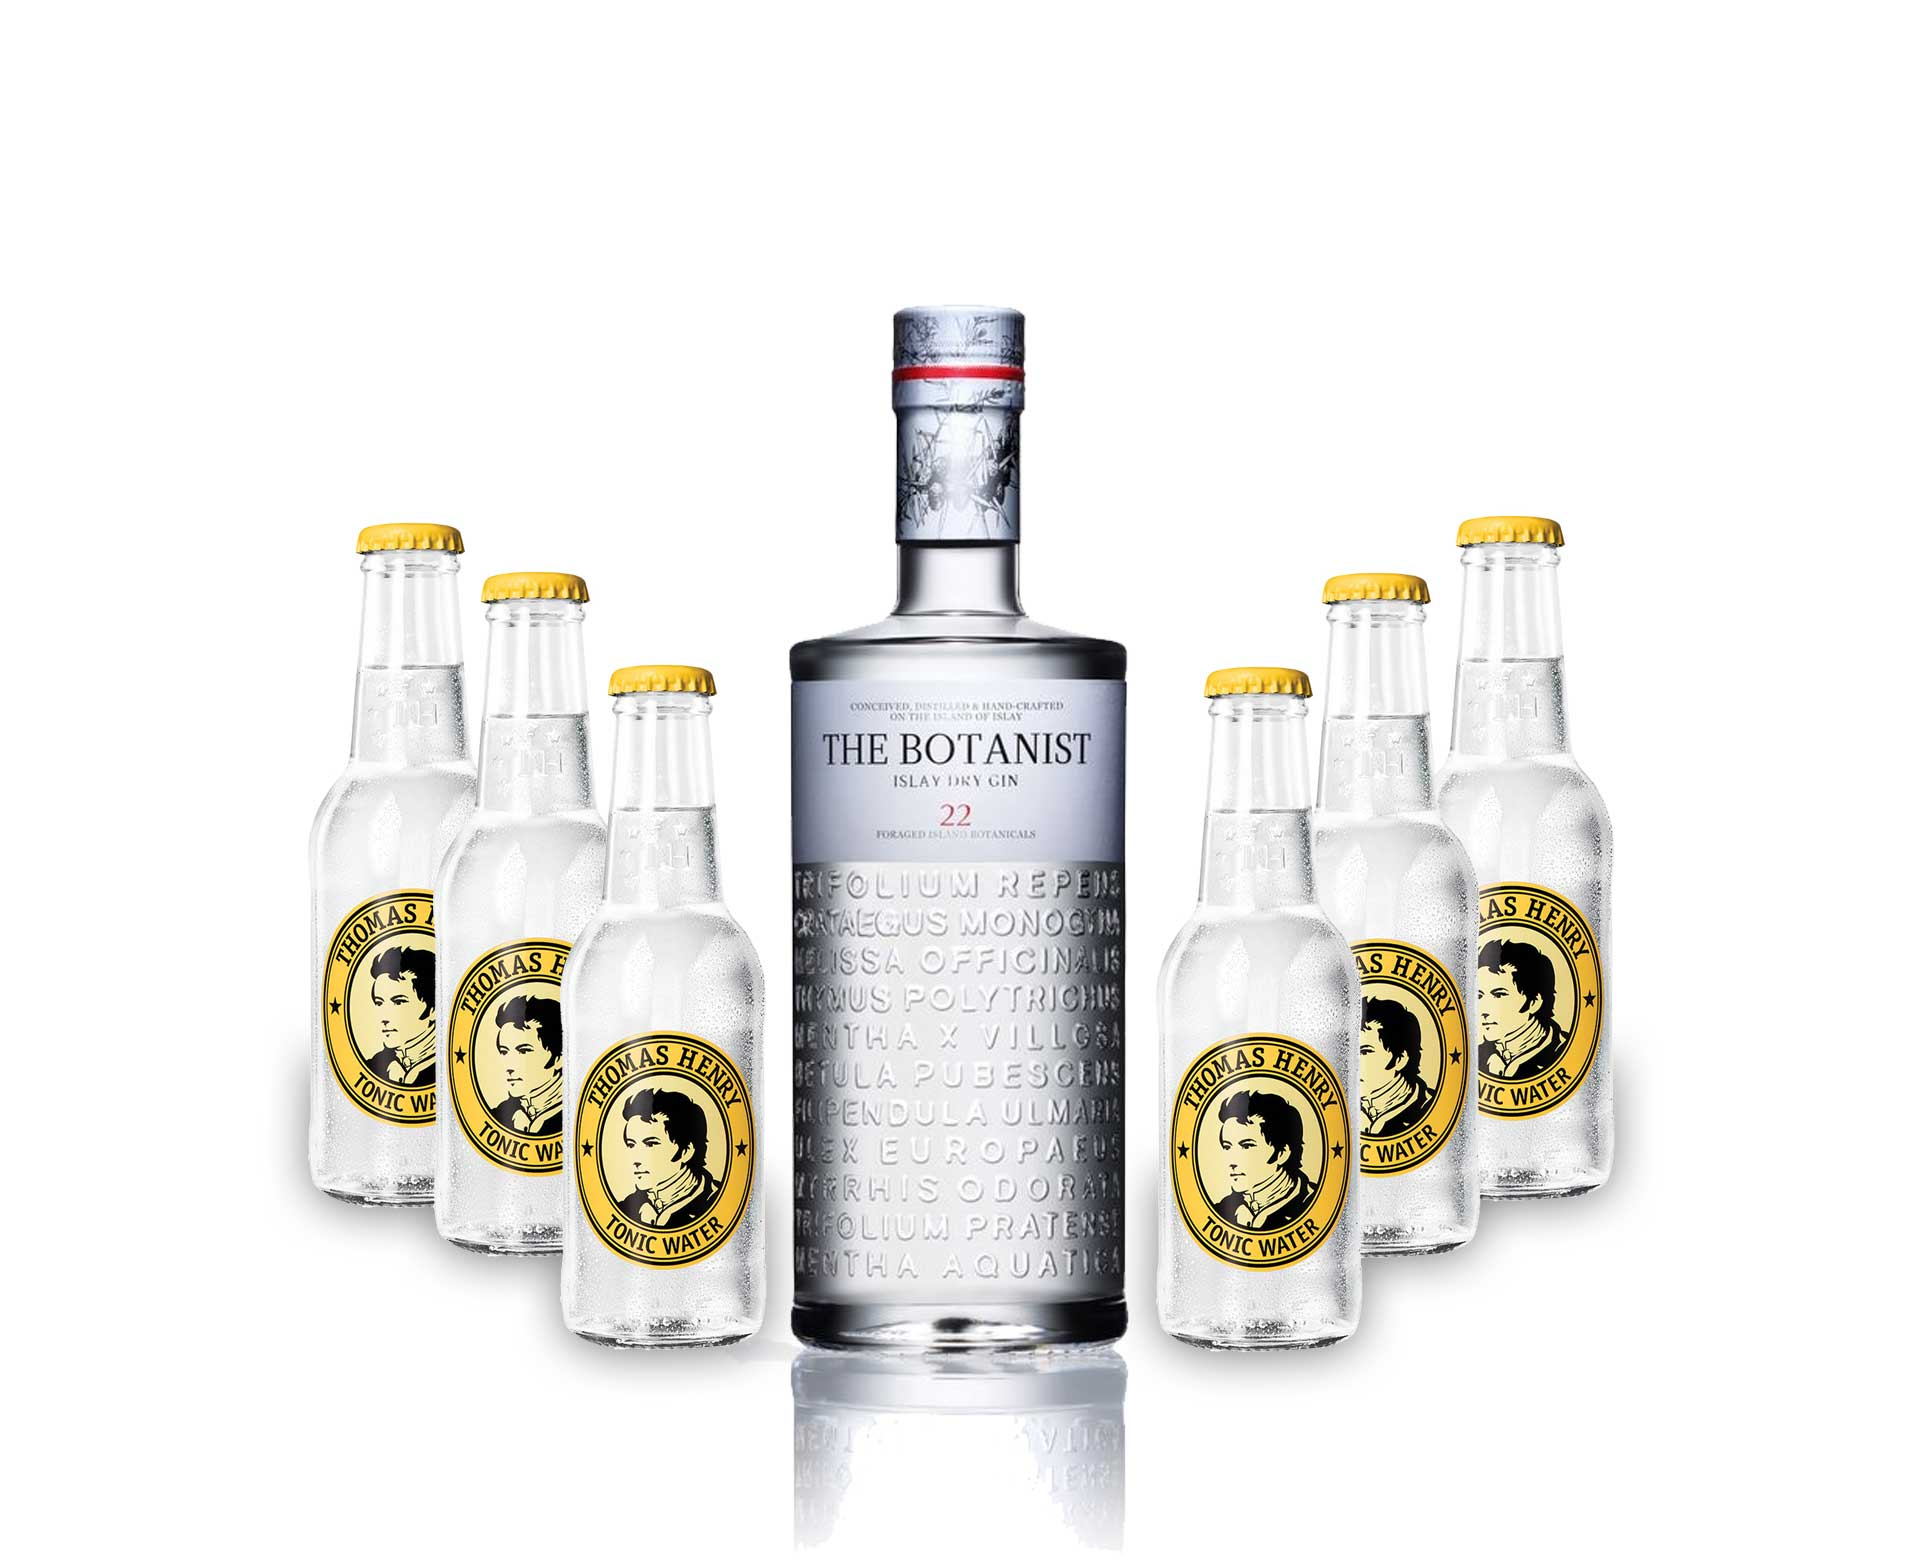 Gin Tonic Set - The Botanist Islay Dry Gin 0,7l 700ml (46% Vol) + 6x Thomas Henry Tonic Water 200ml - Inkl. Pfand MEHRWEG